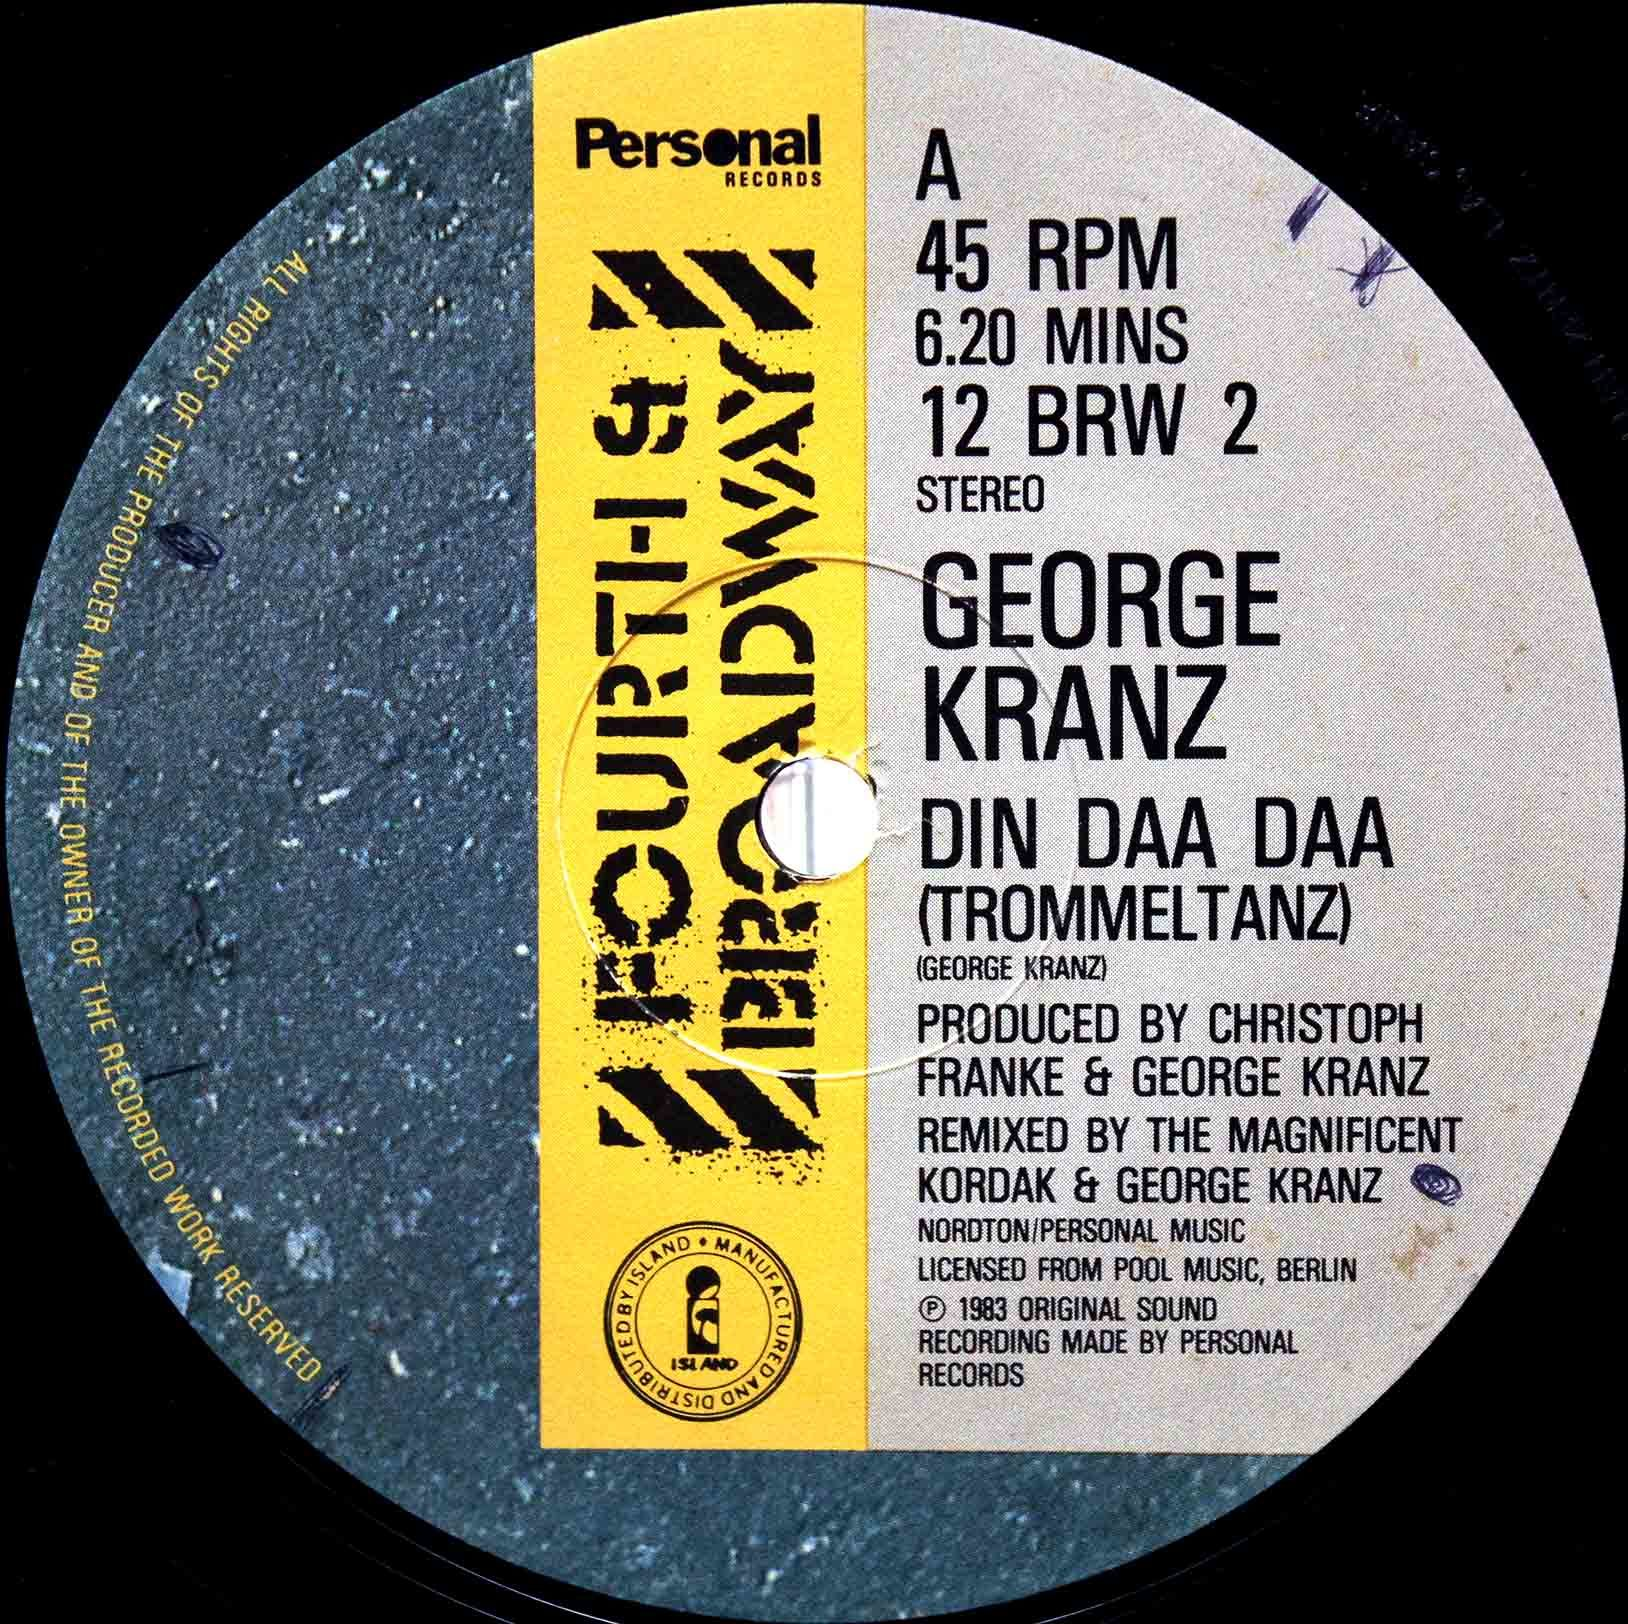 George Kranz – Din Daa Daa 03